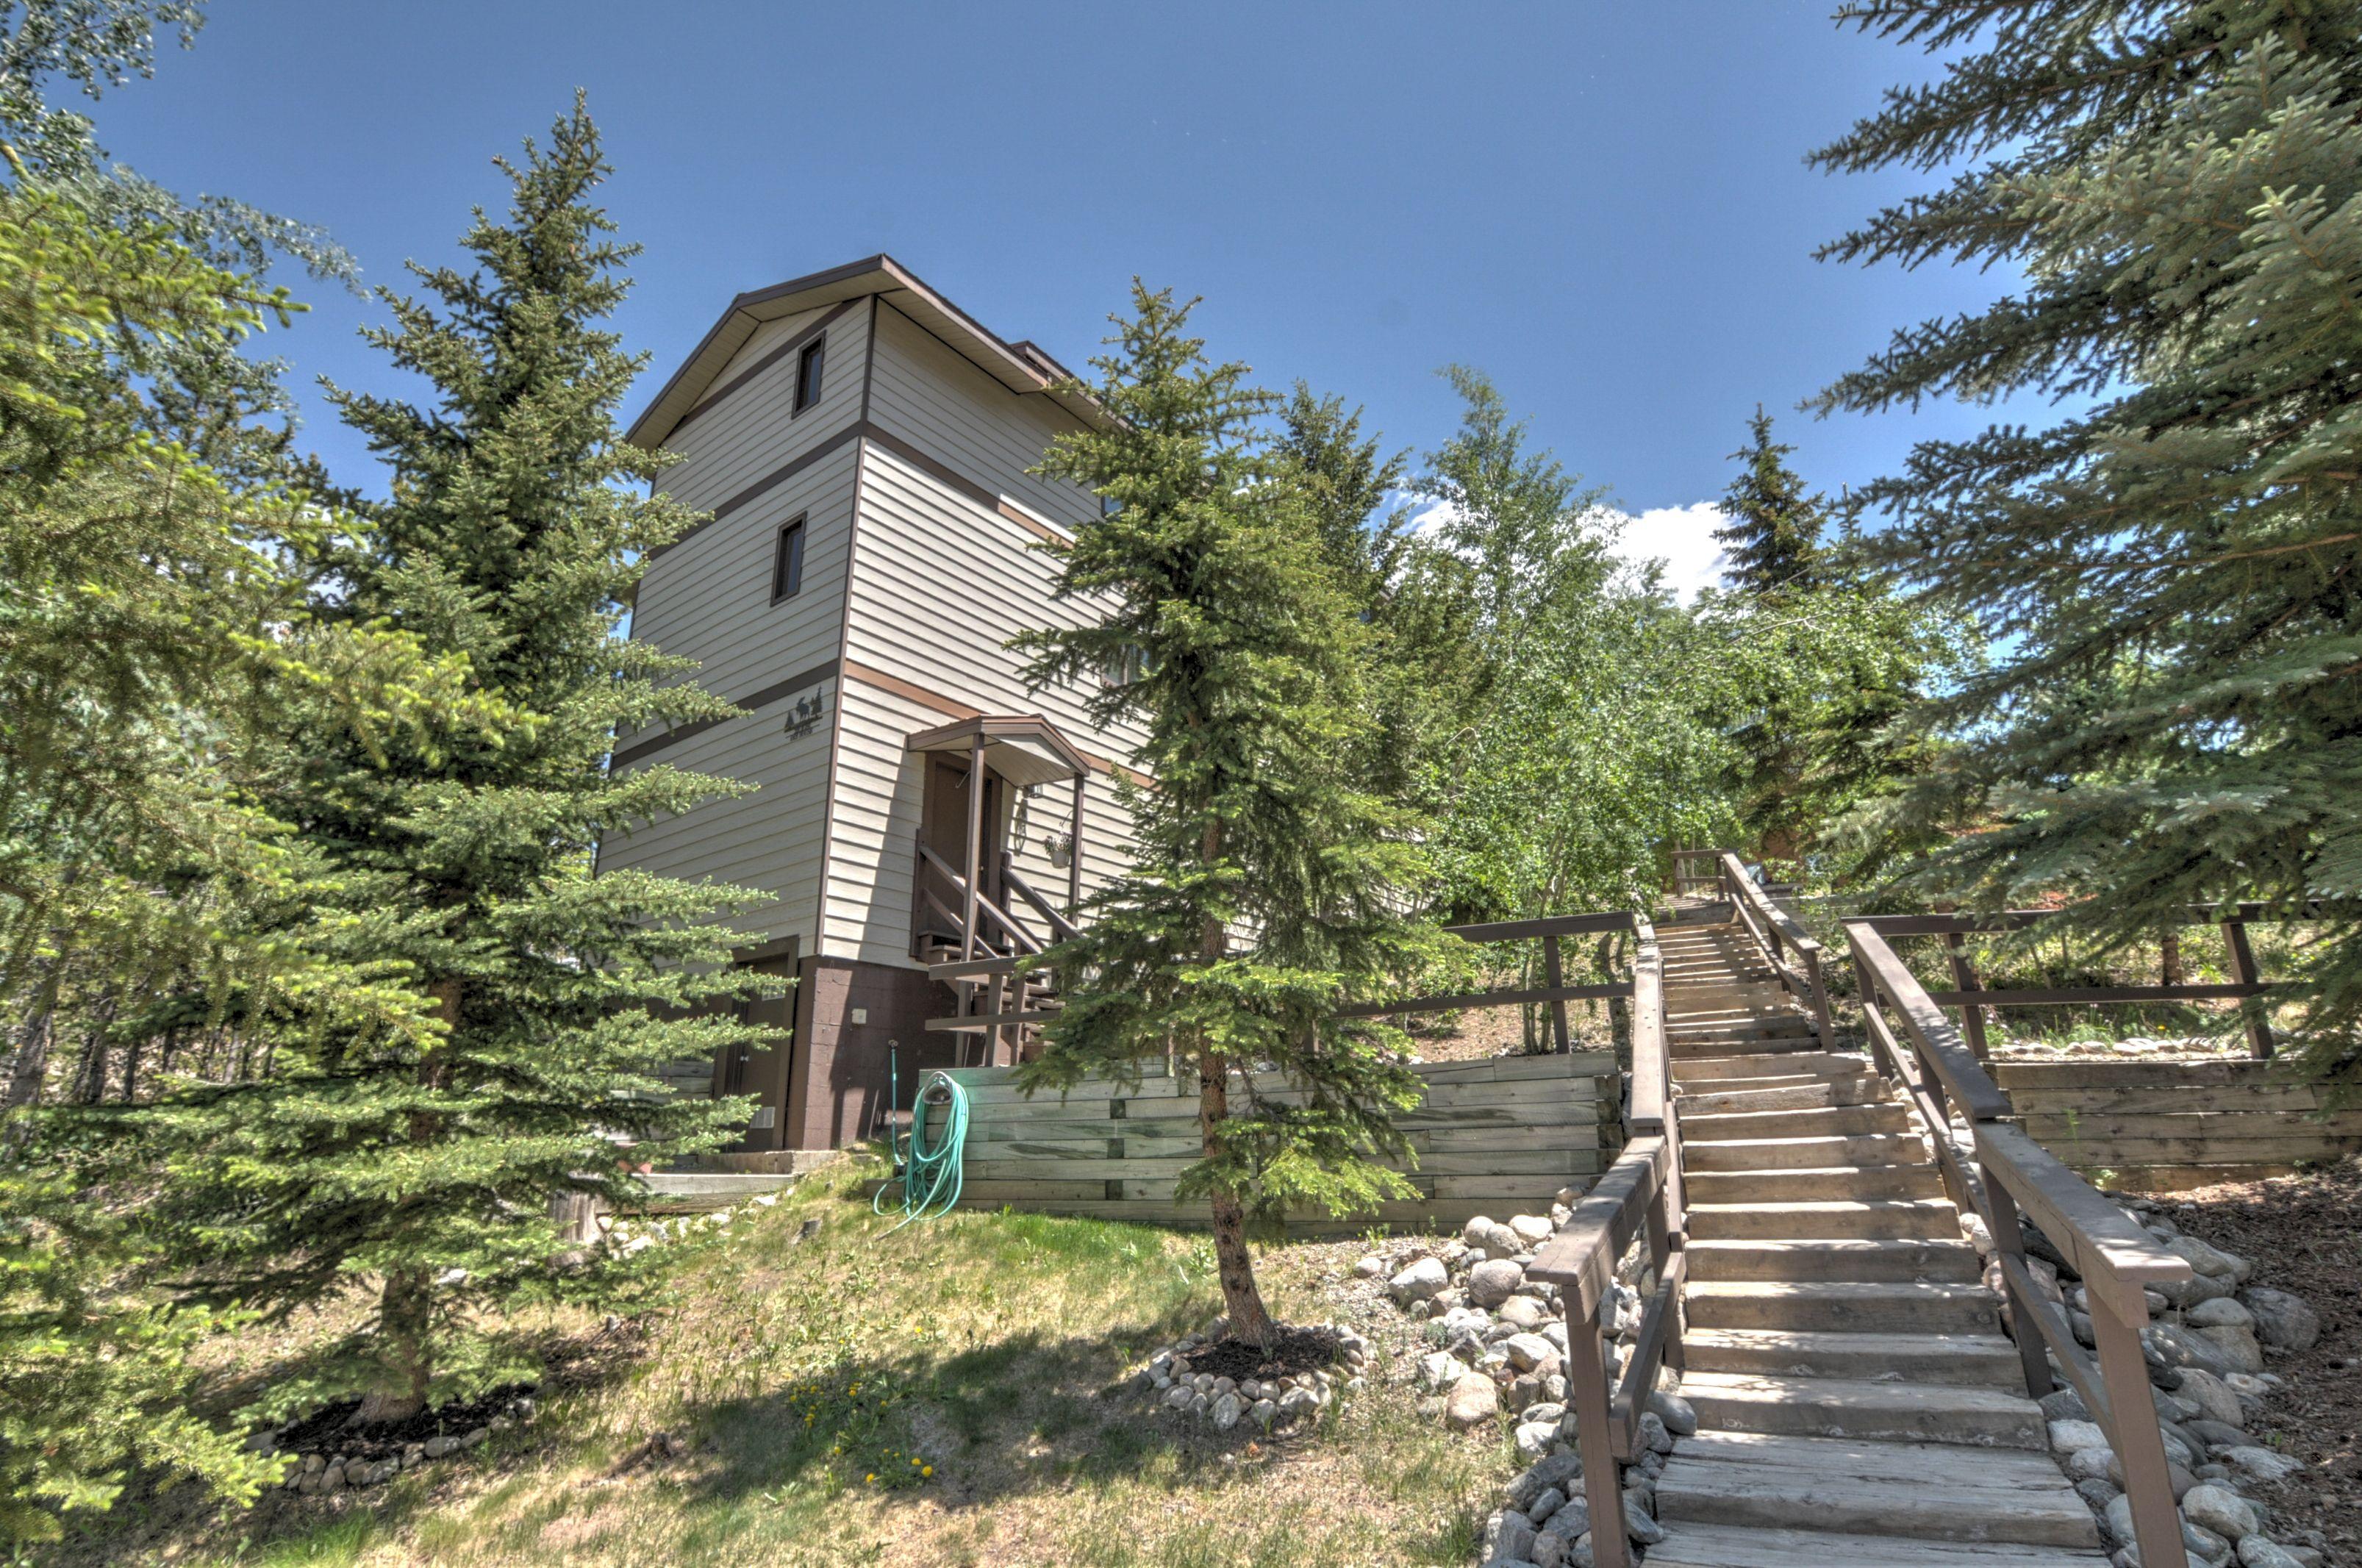 218 Pitkin STREET # 10 FRISCO, Colorado 80443